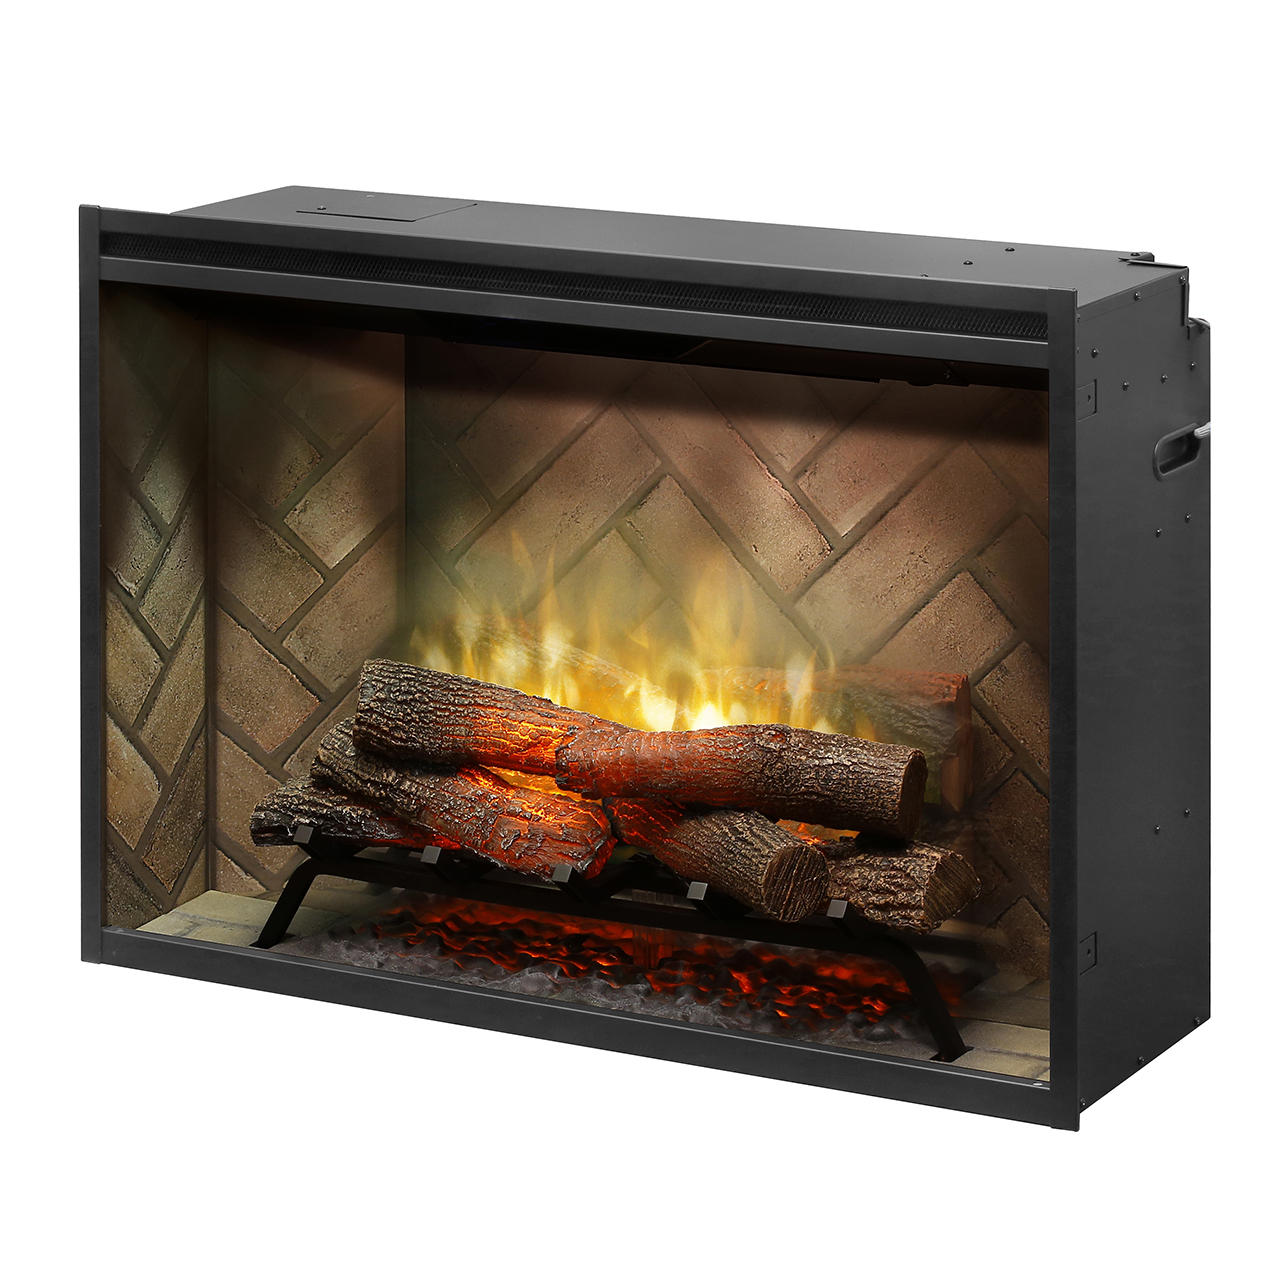 "Dimplex RBF36 Revillusion 36"" Built-In Electric Firebox"